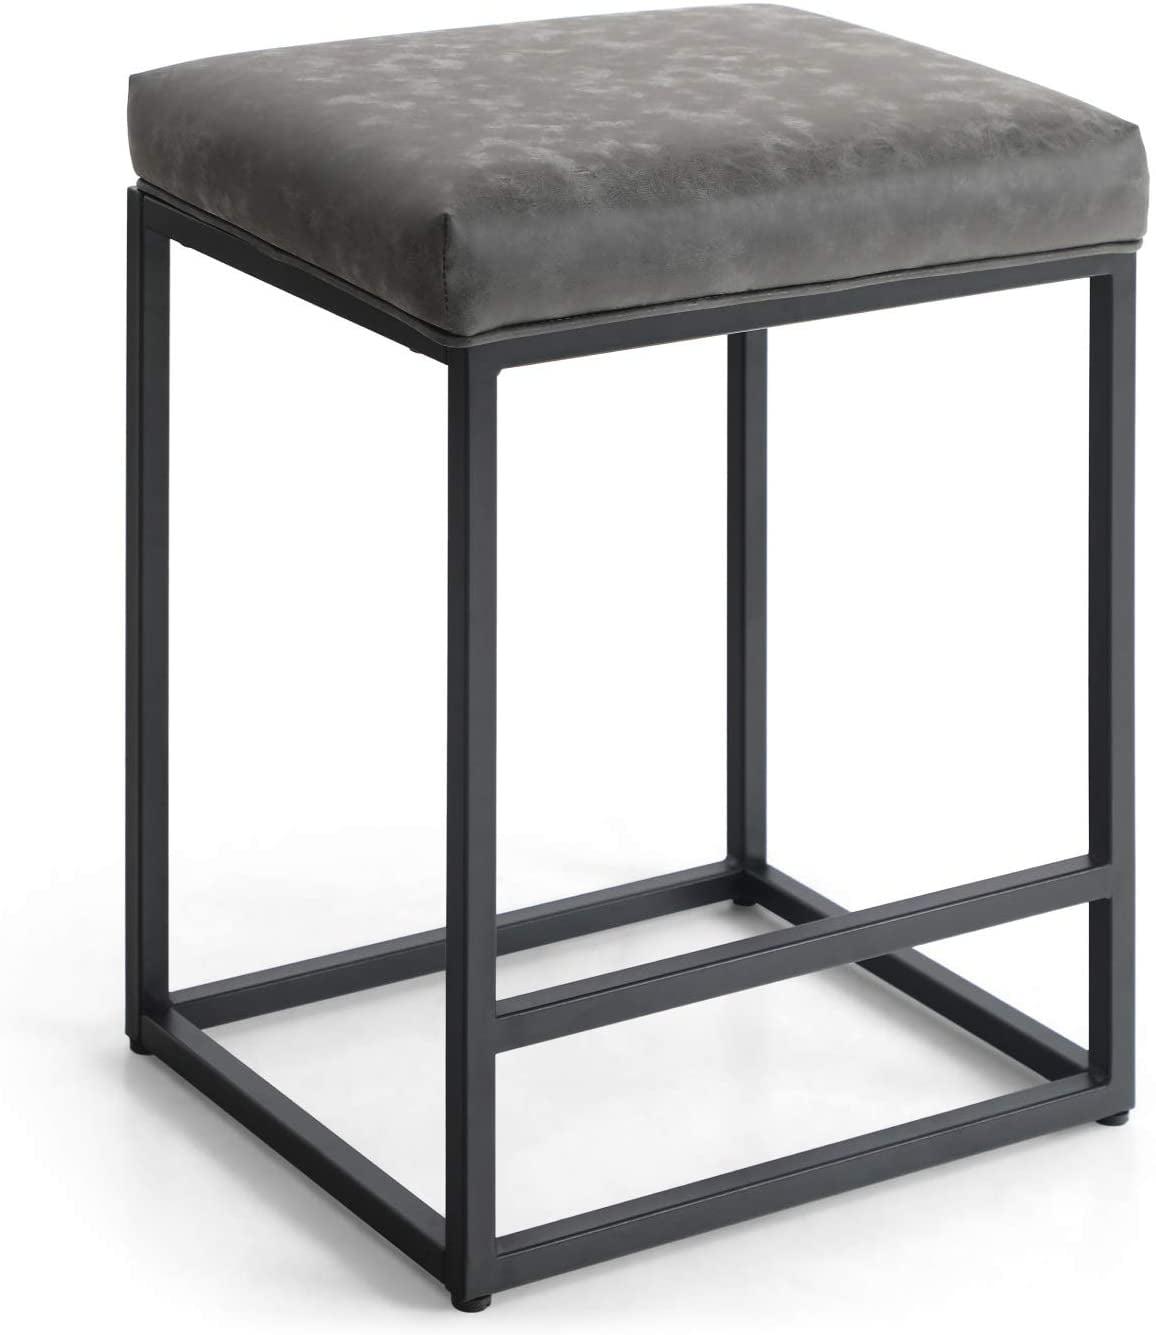 "mf studio 24"" bar stool counter height bar stools with"